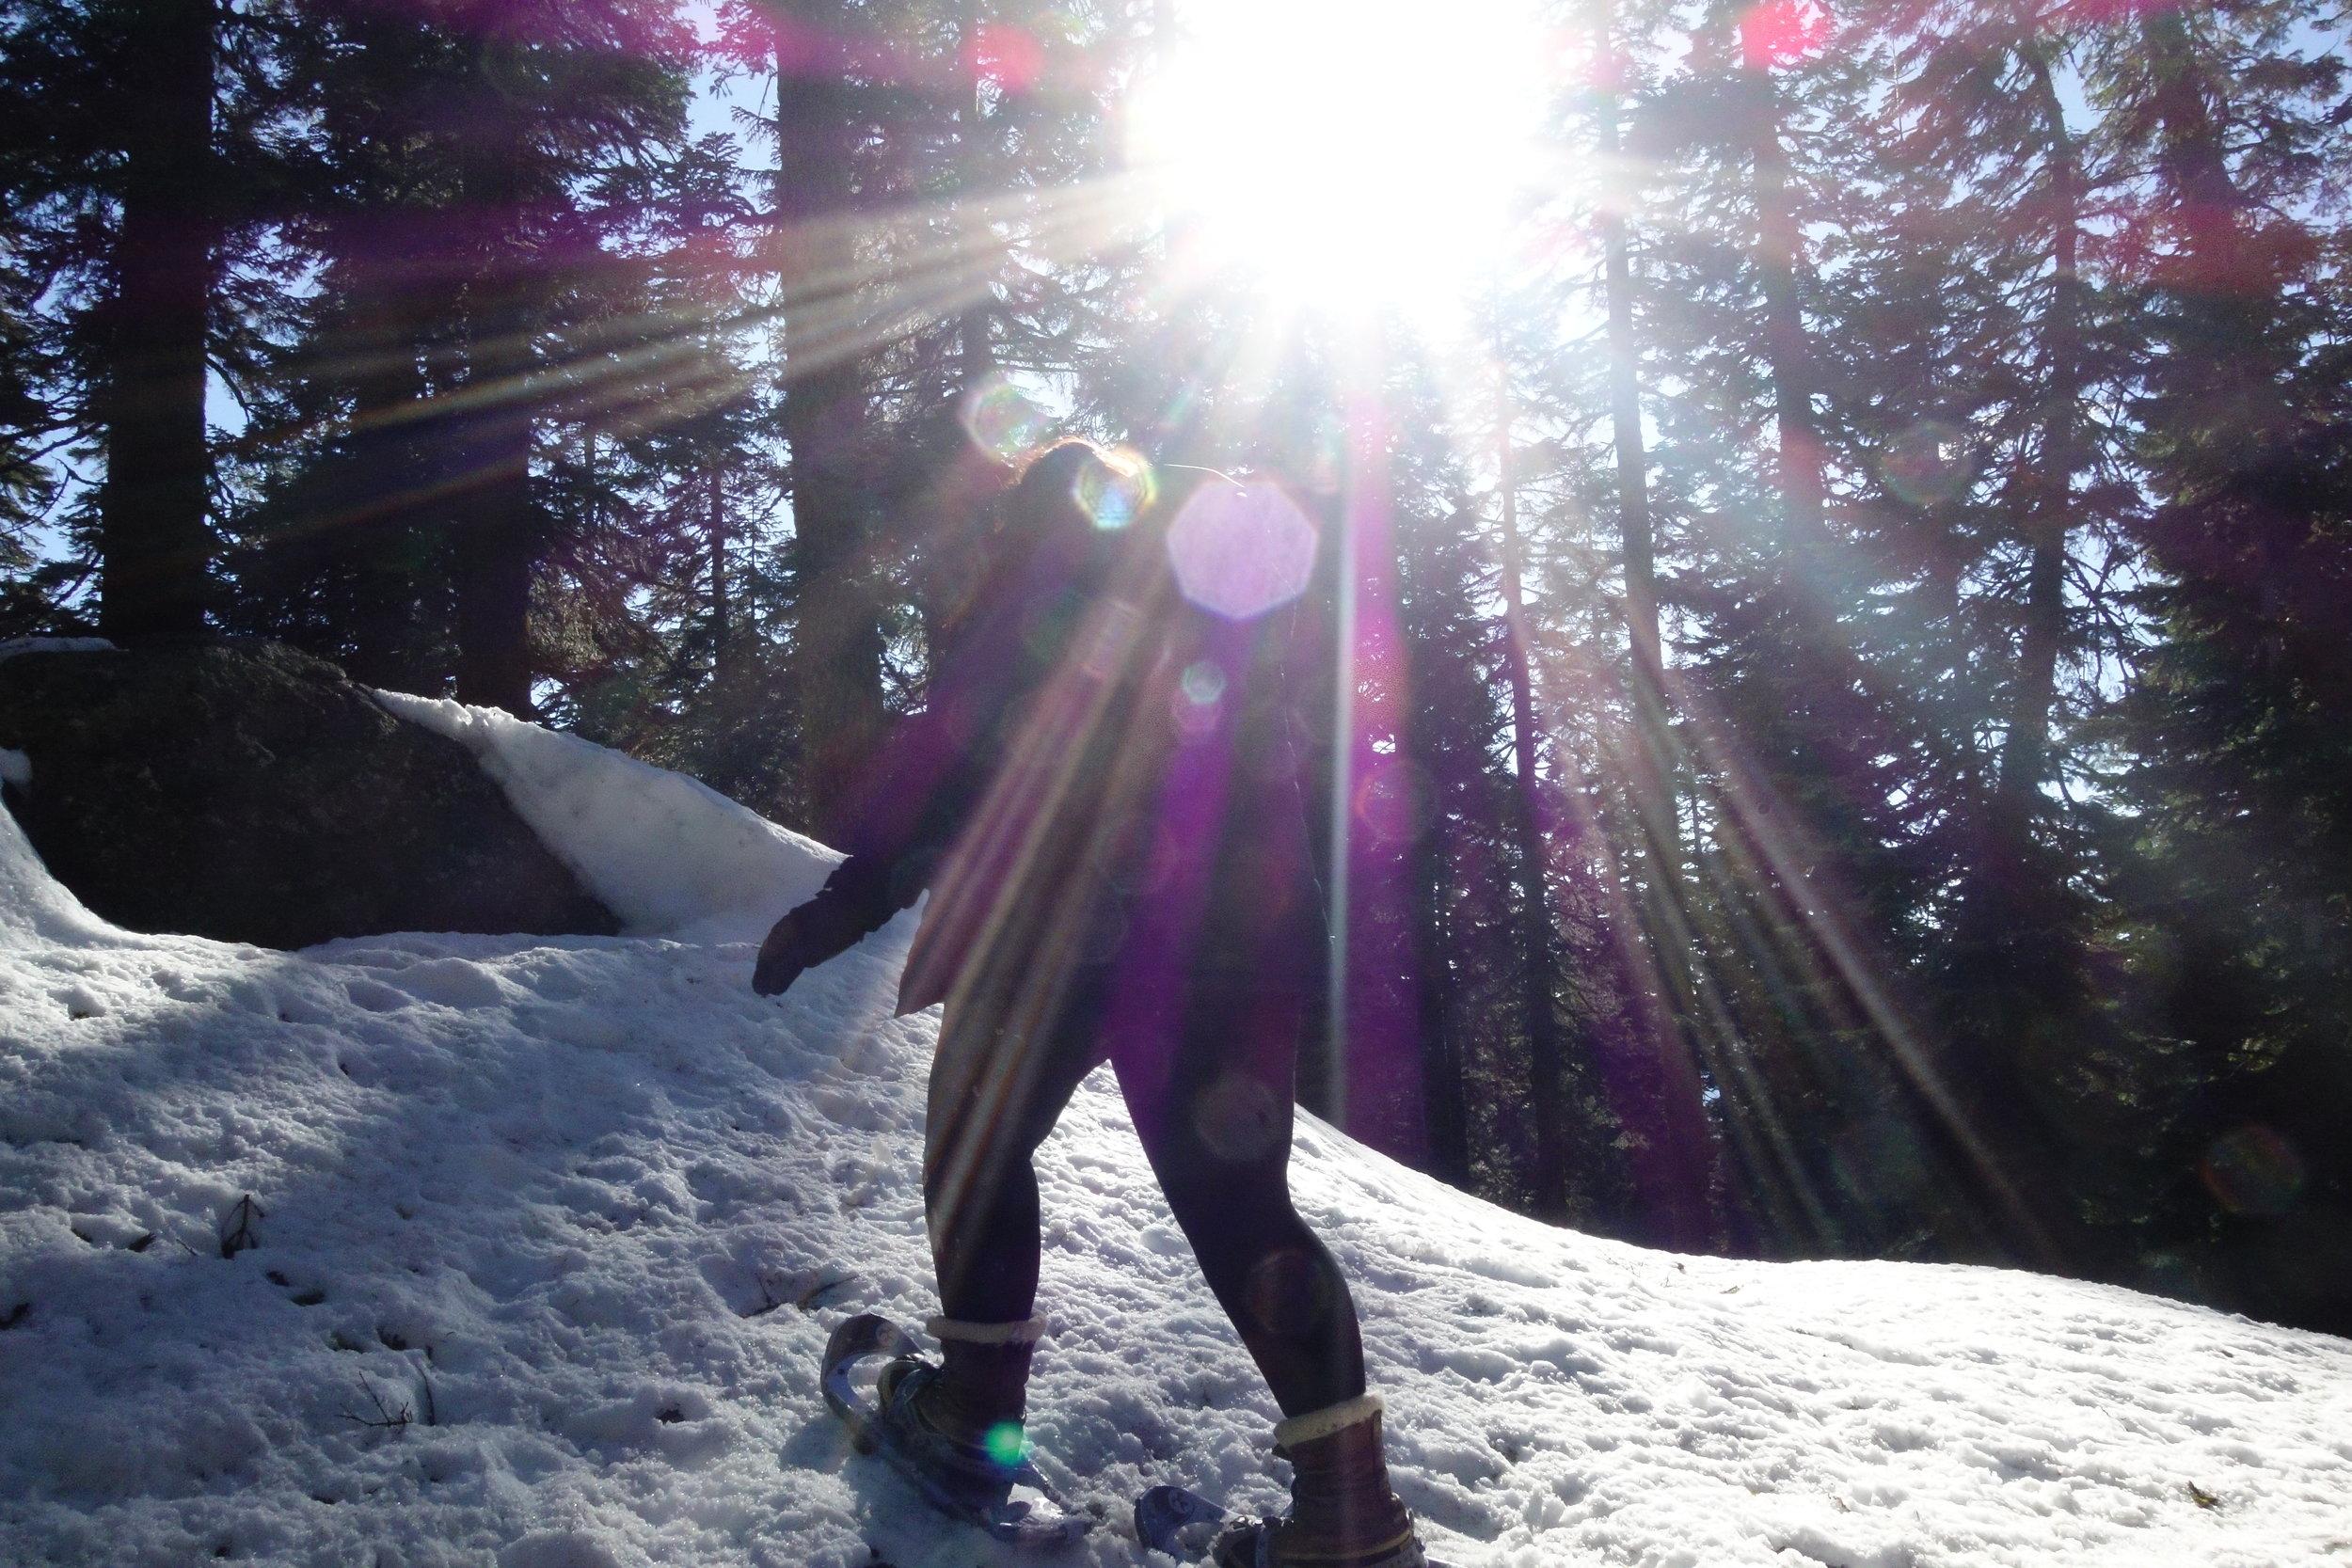 Mt. Shasta Spiritual Tours